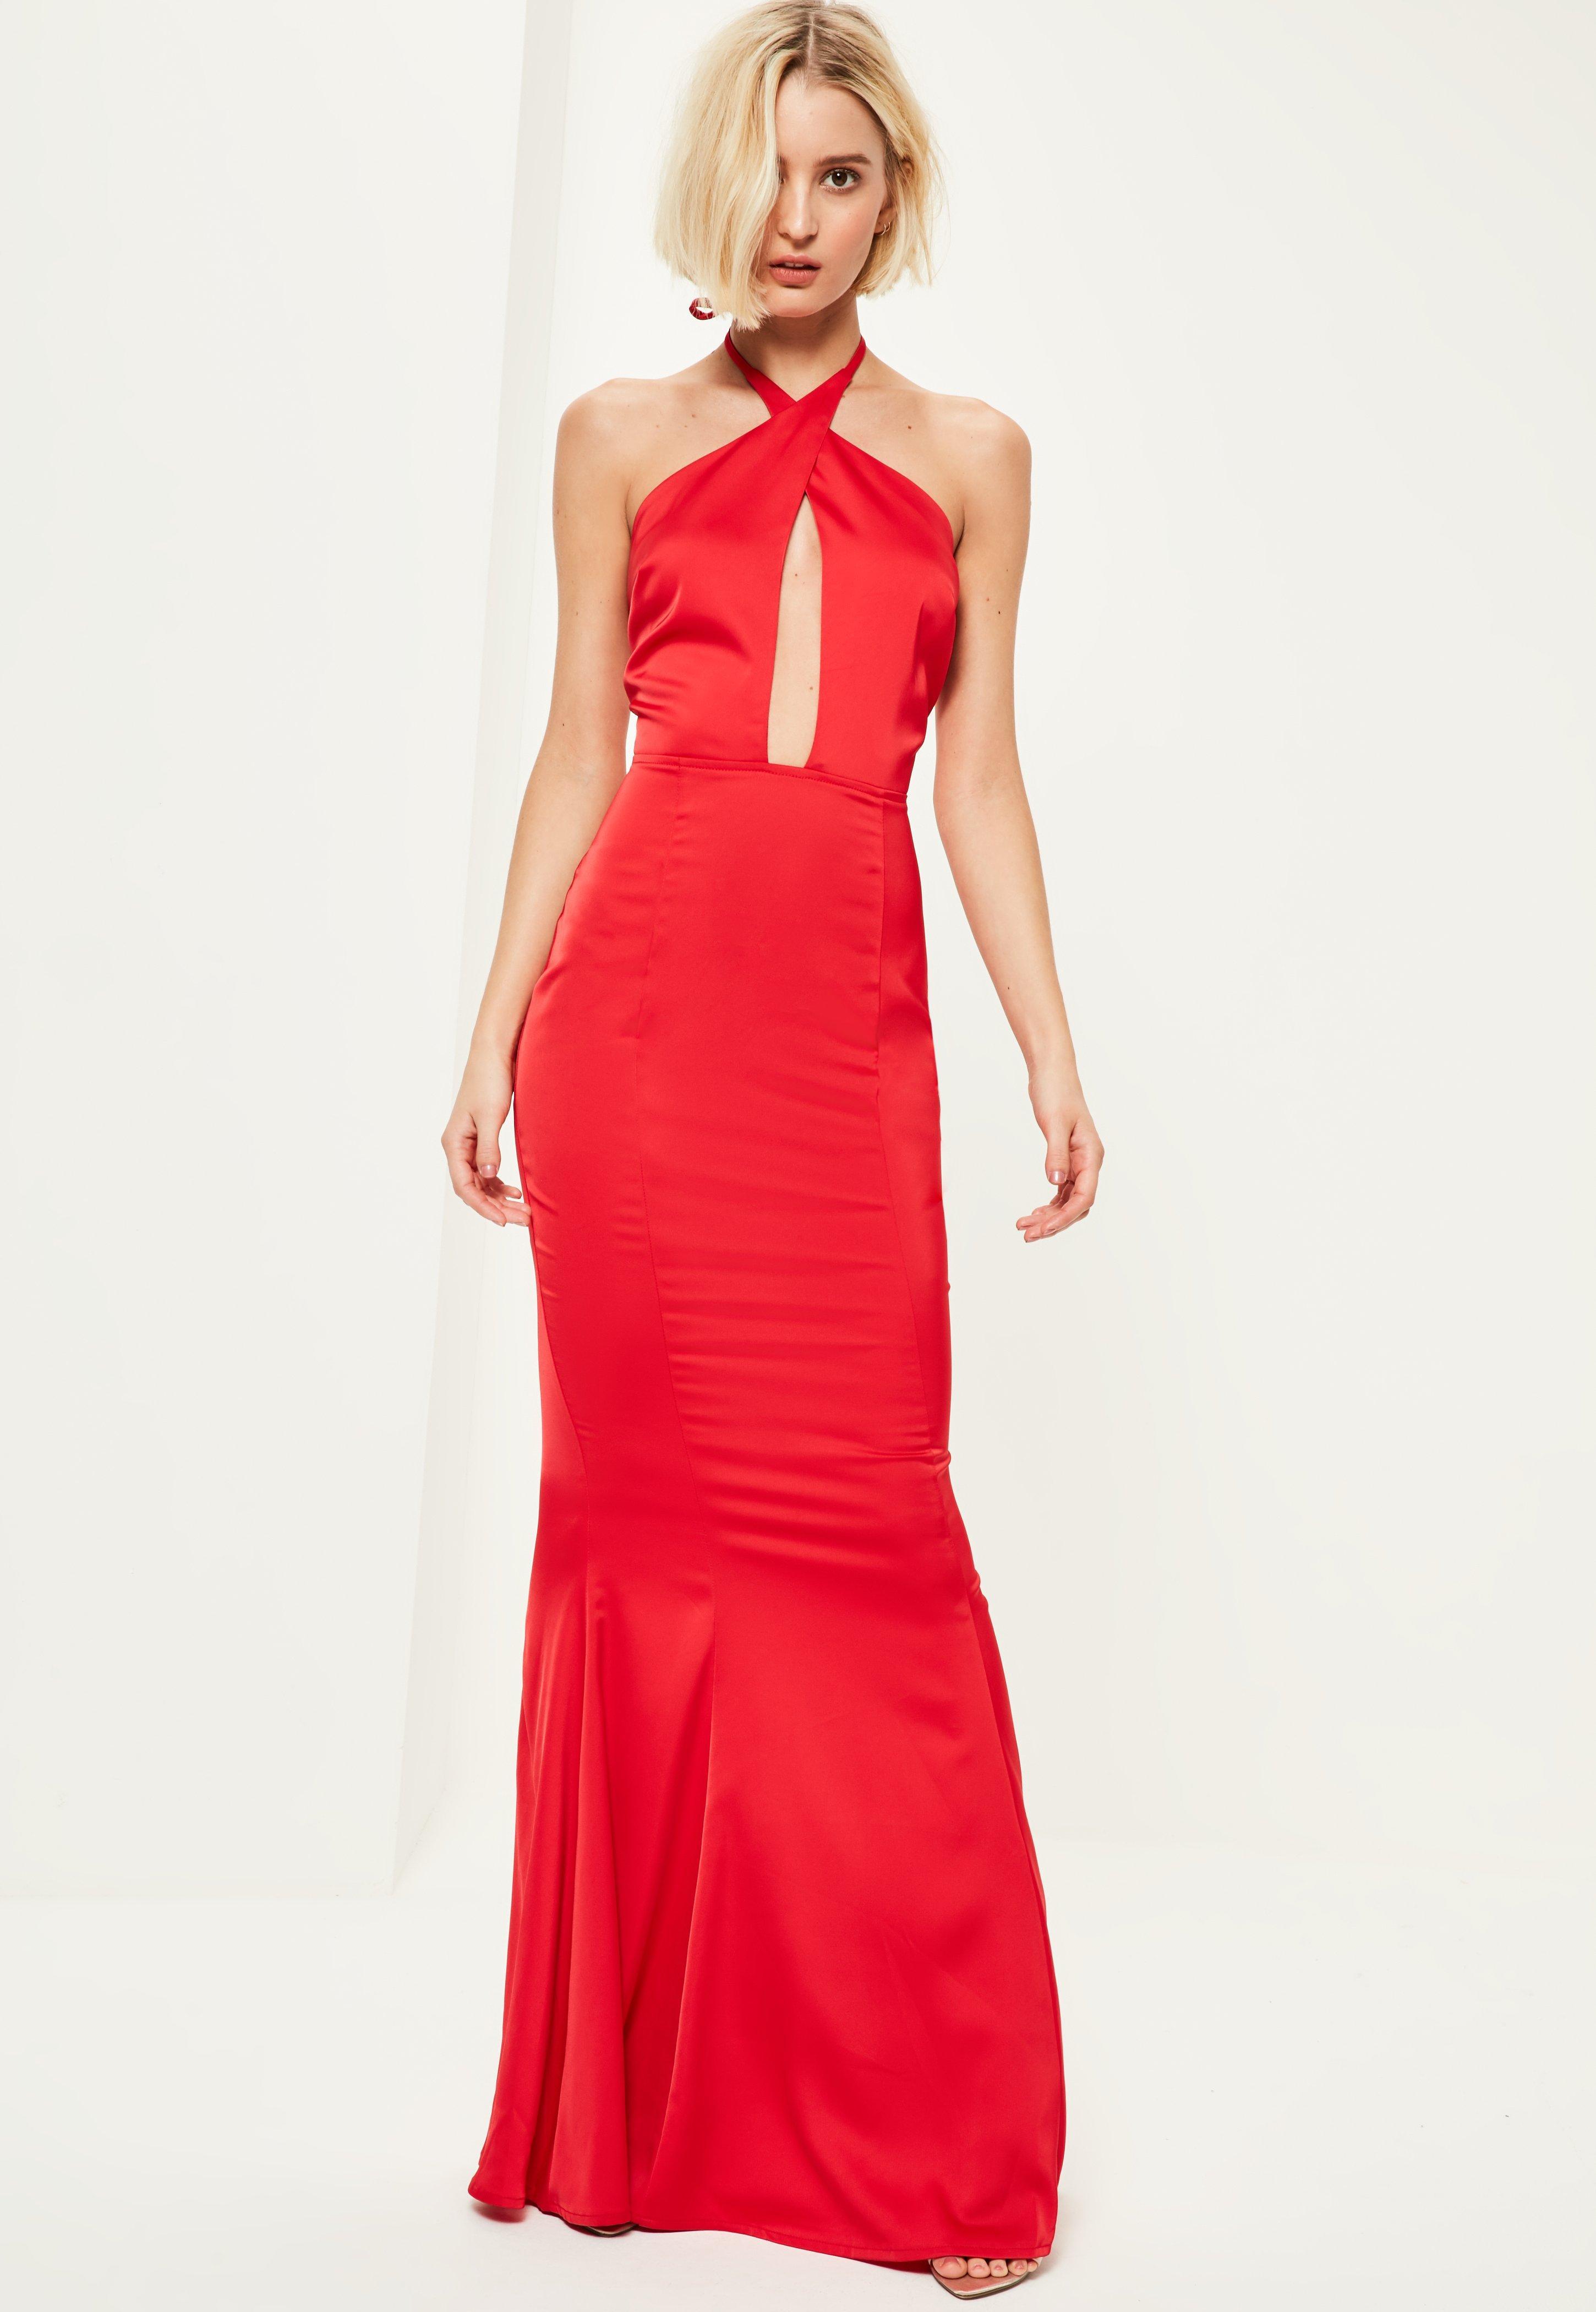 Cut Out Dresses Side Cut Dress Missguided Australia